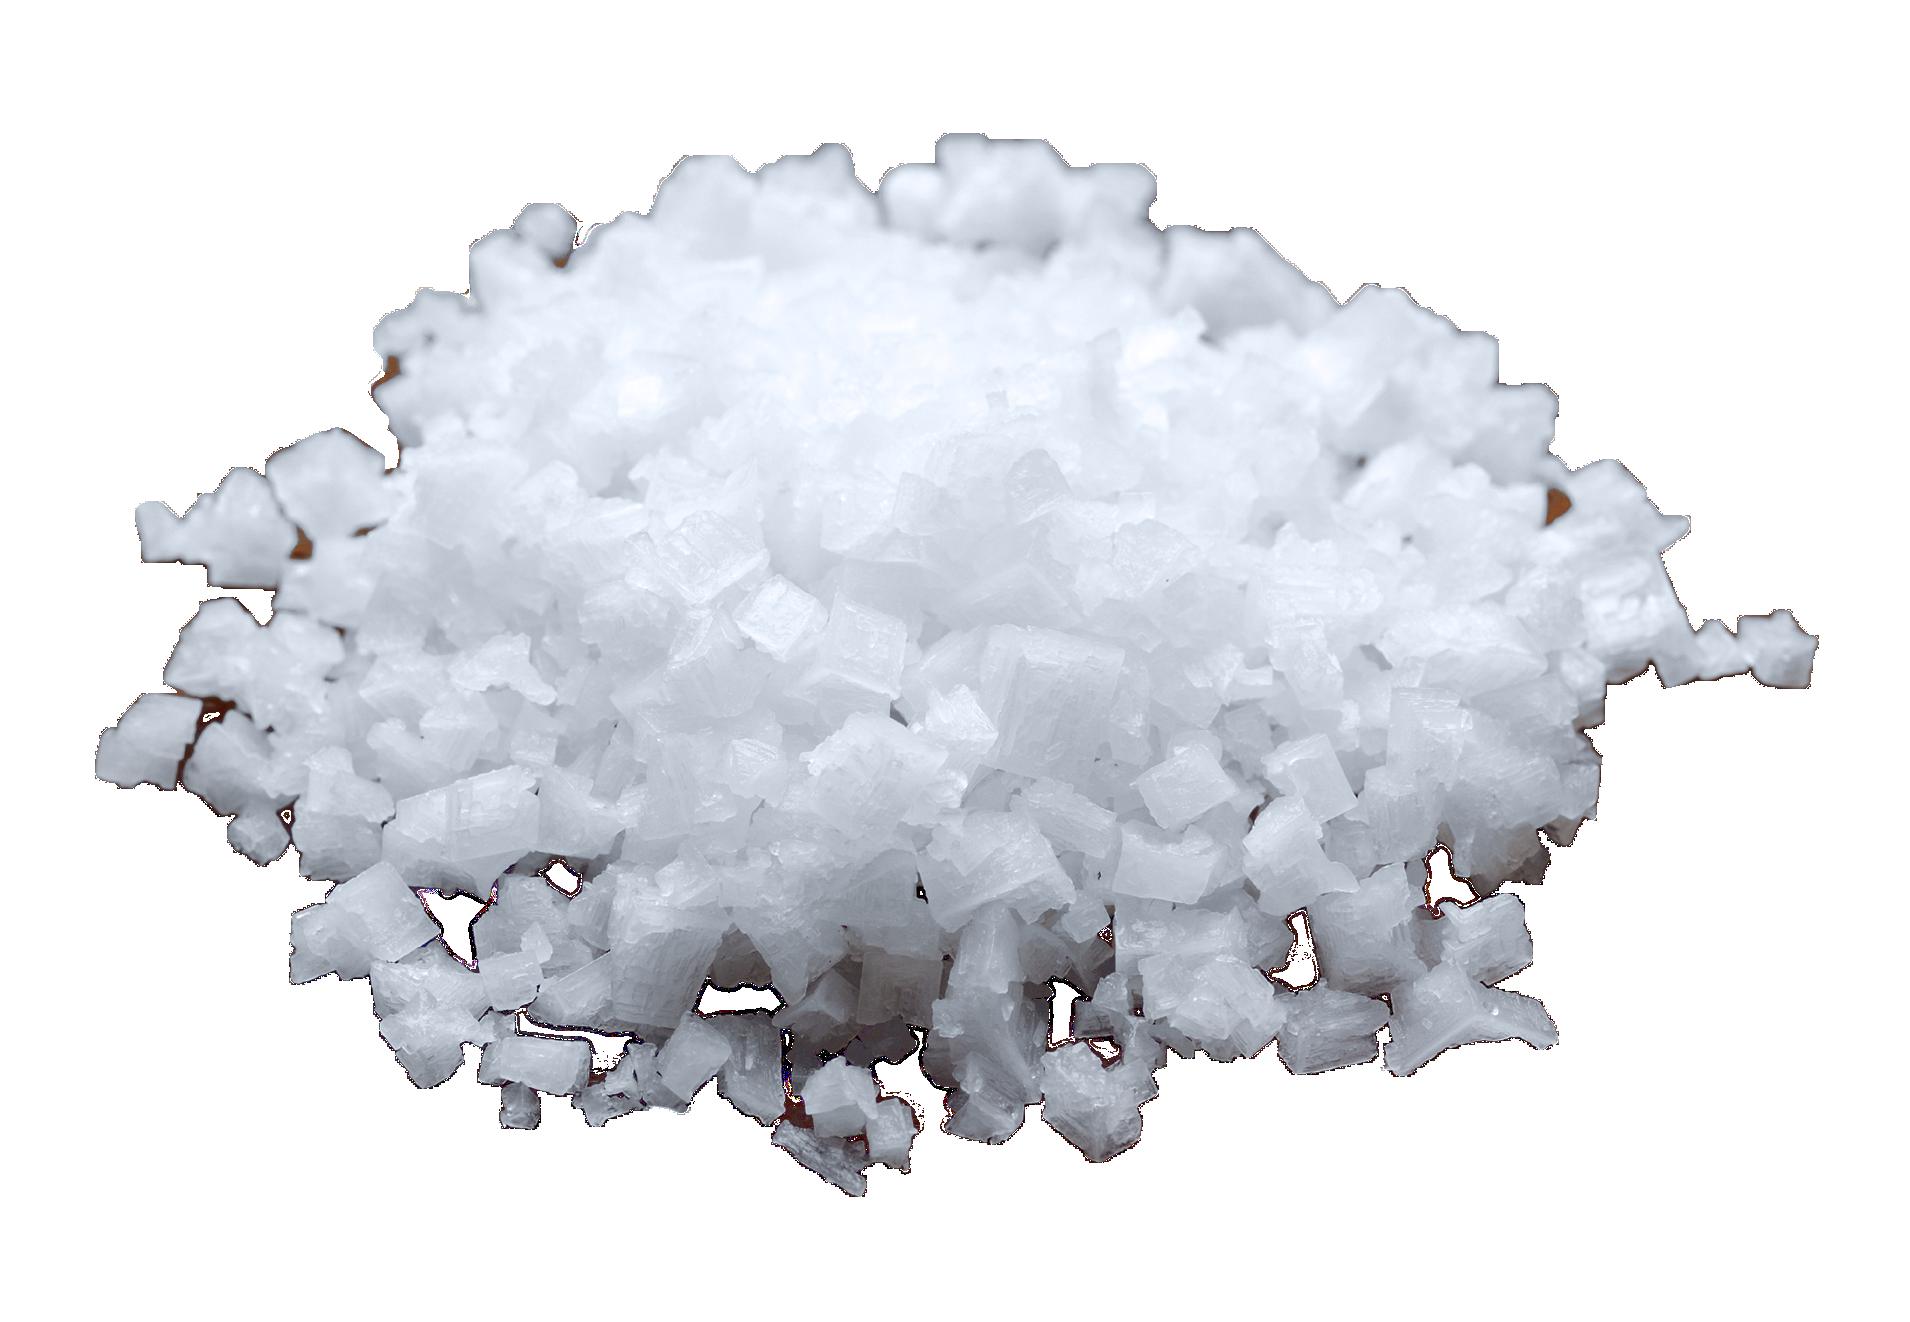 Png image purepng free. Crystal clipart salt crystal